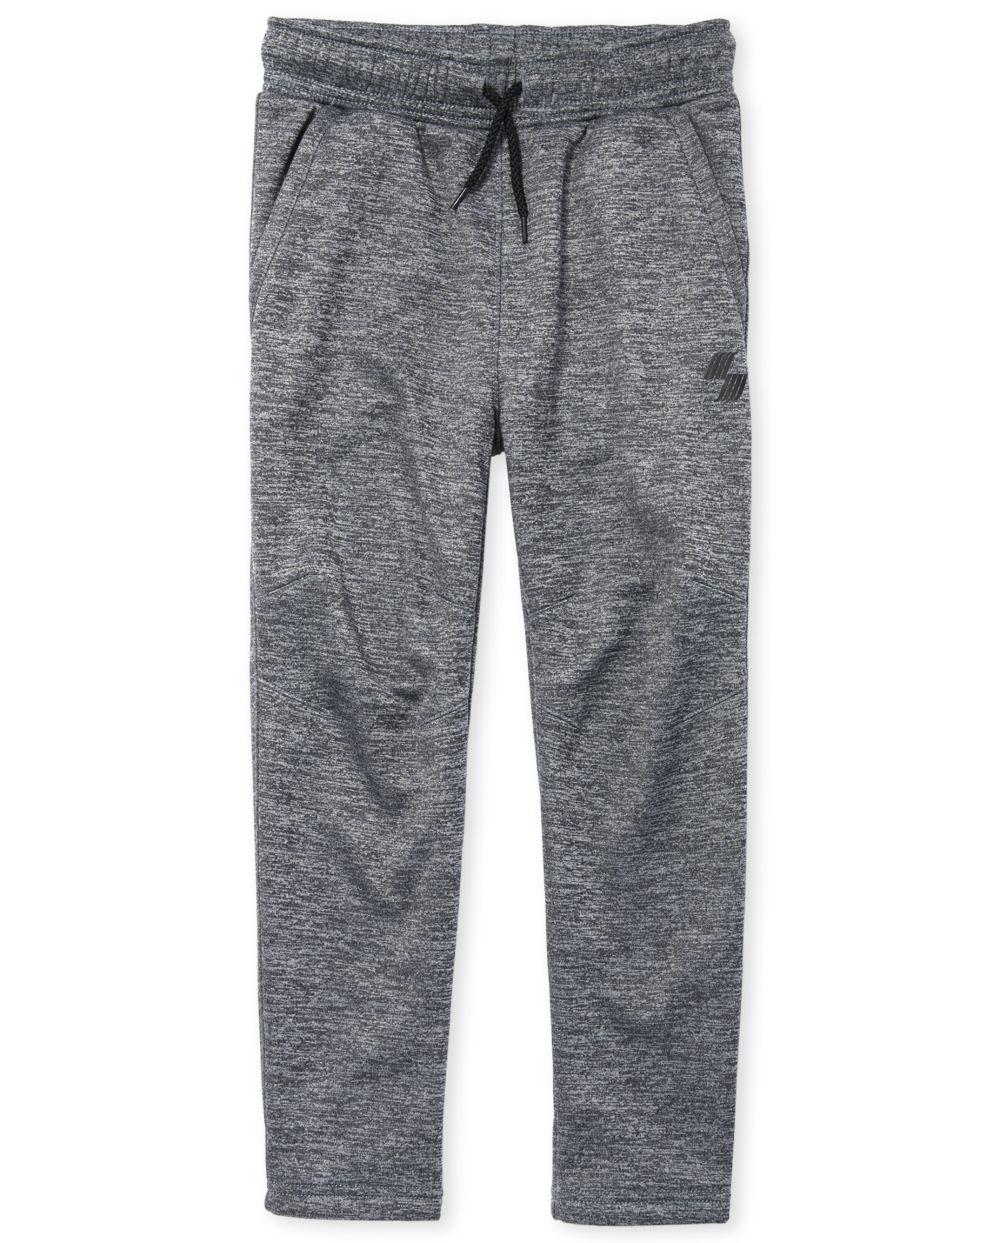 Boys Mix And Match Marled Performance Fleece Pants